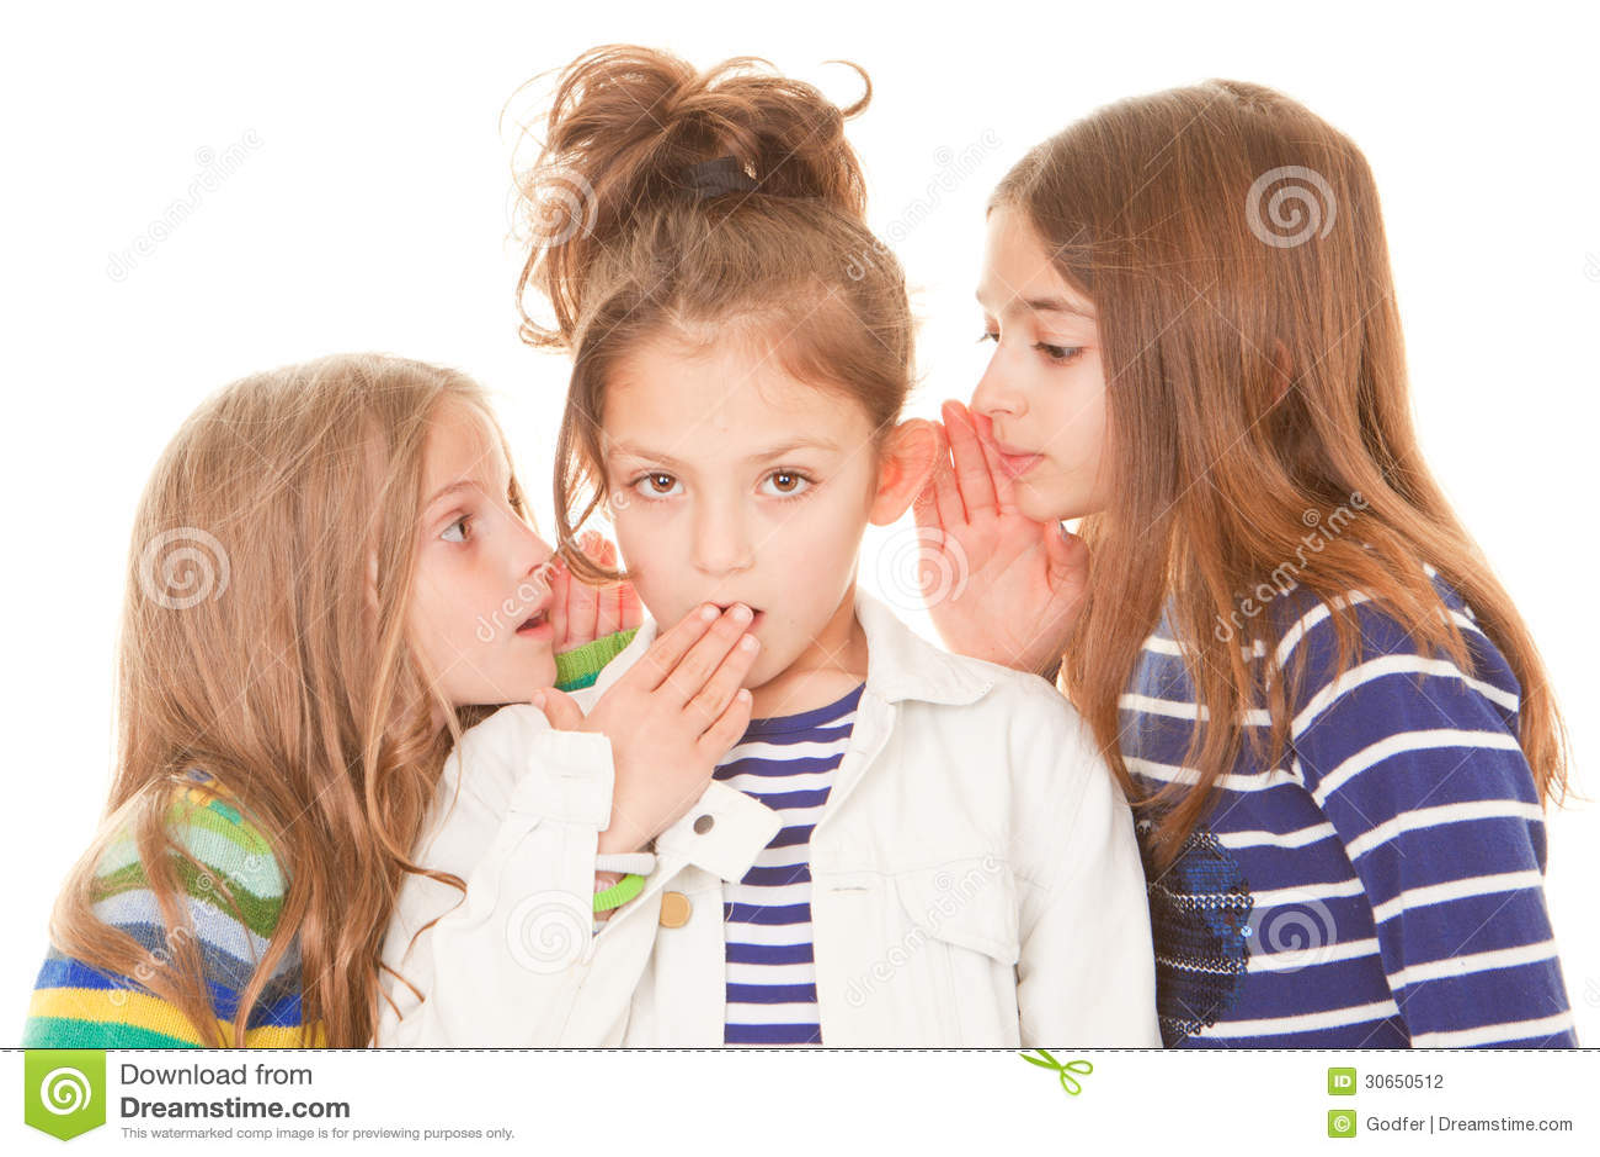 Kids Whispering Bad News Stock Photography - Image: 30650512